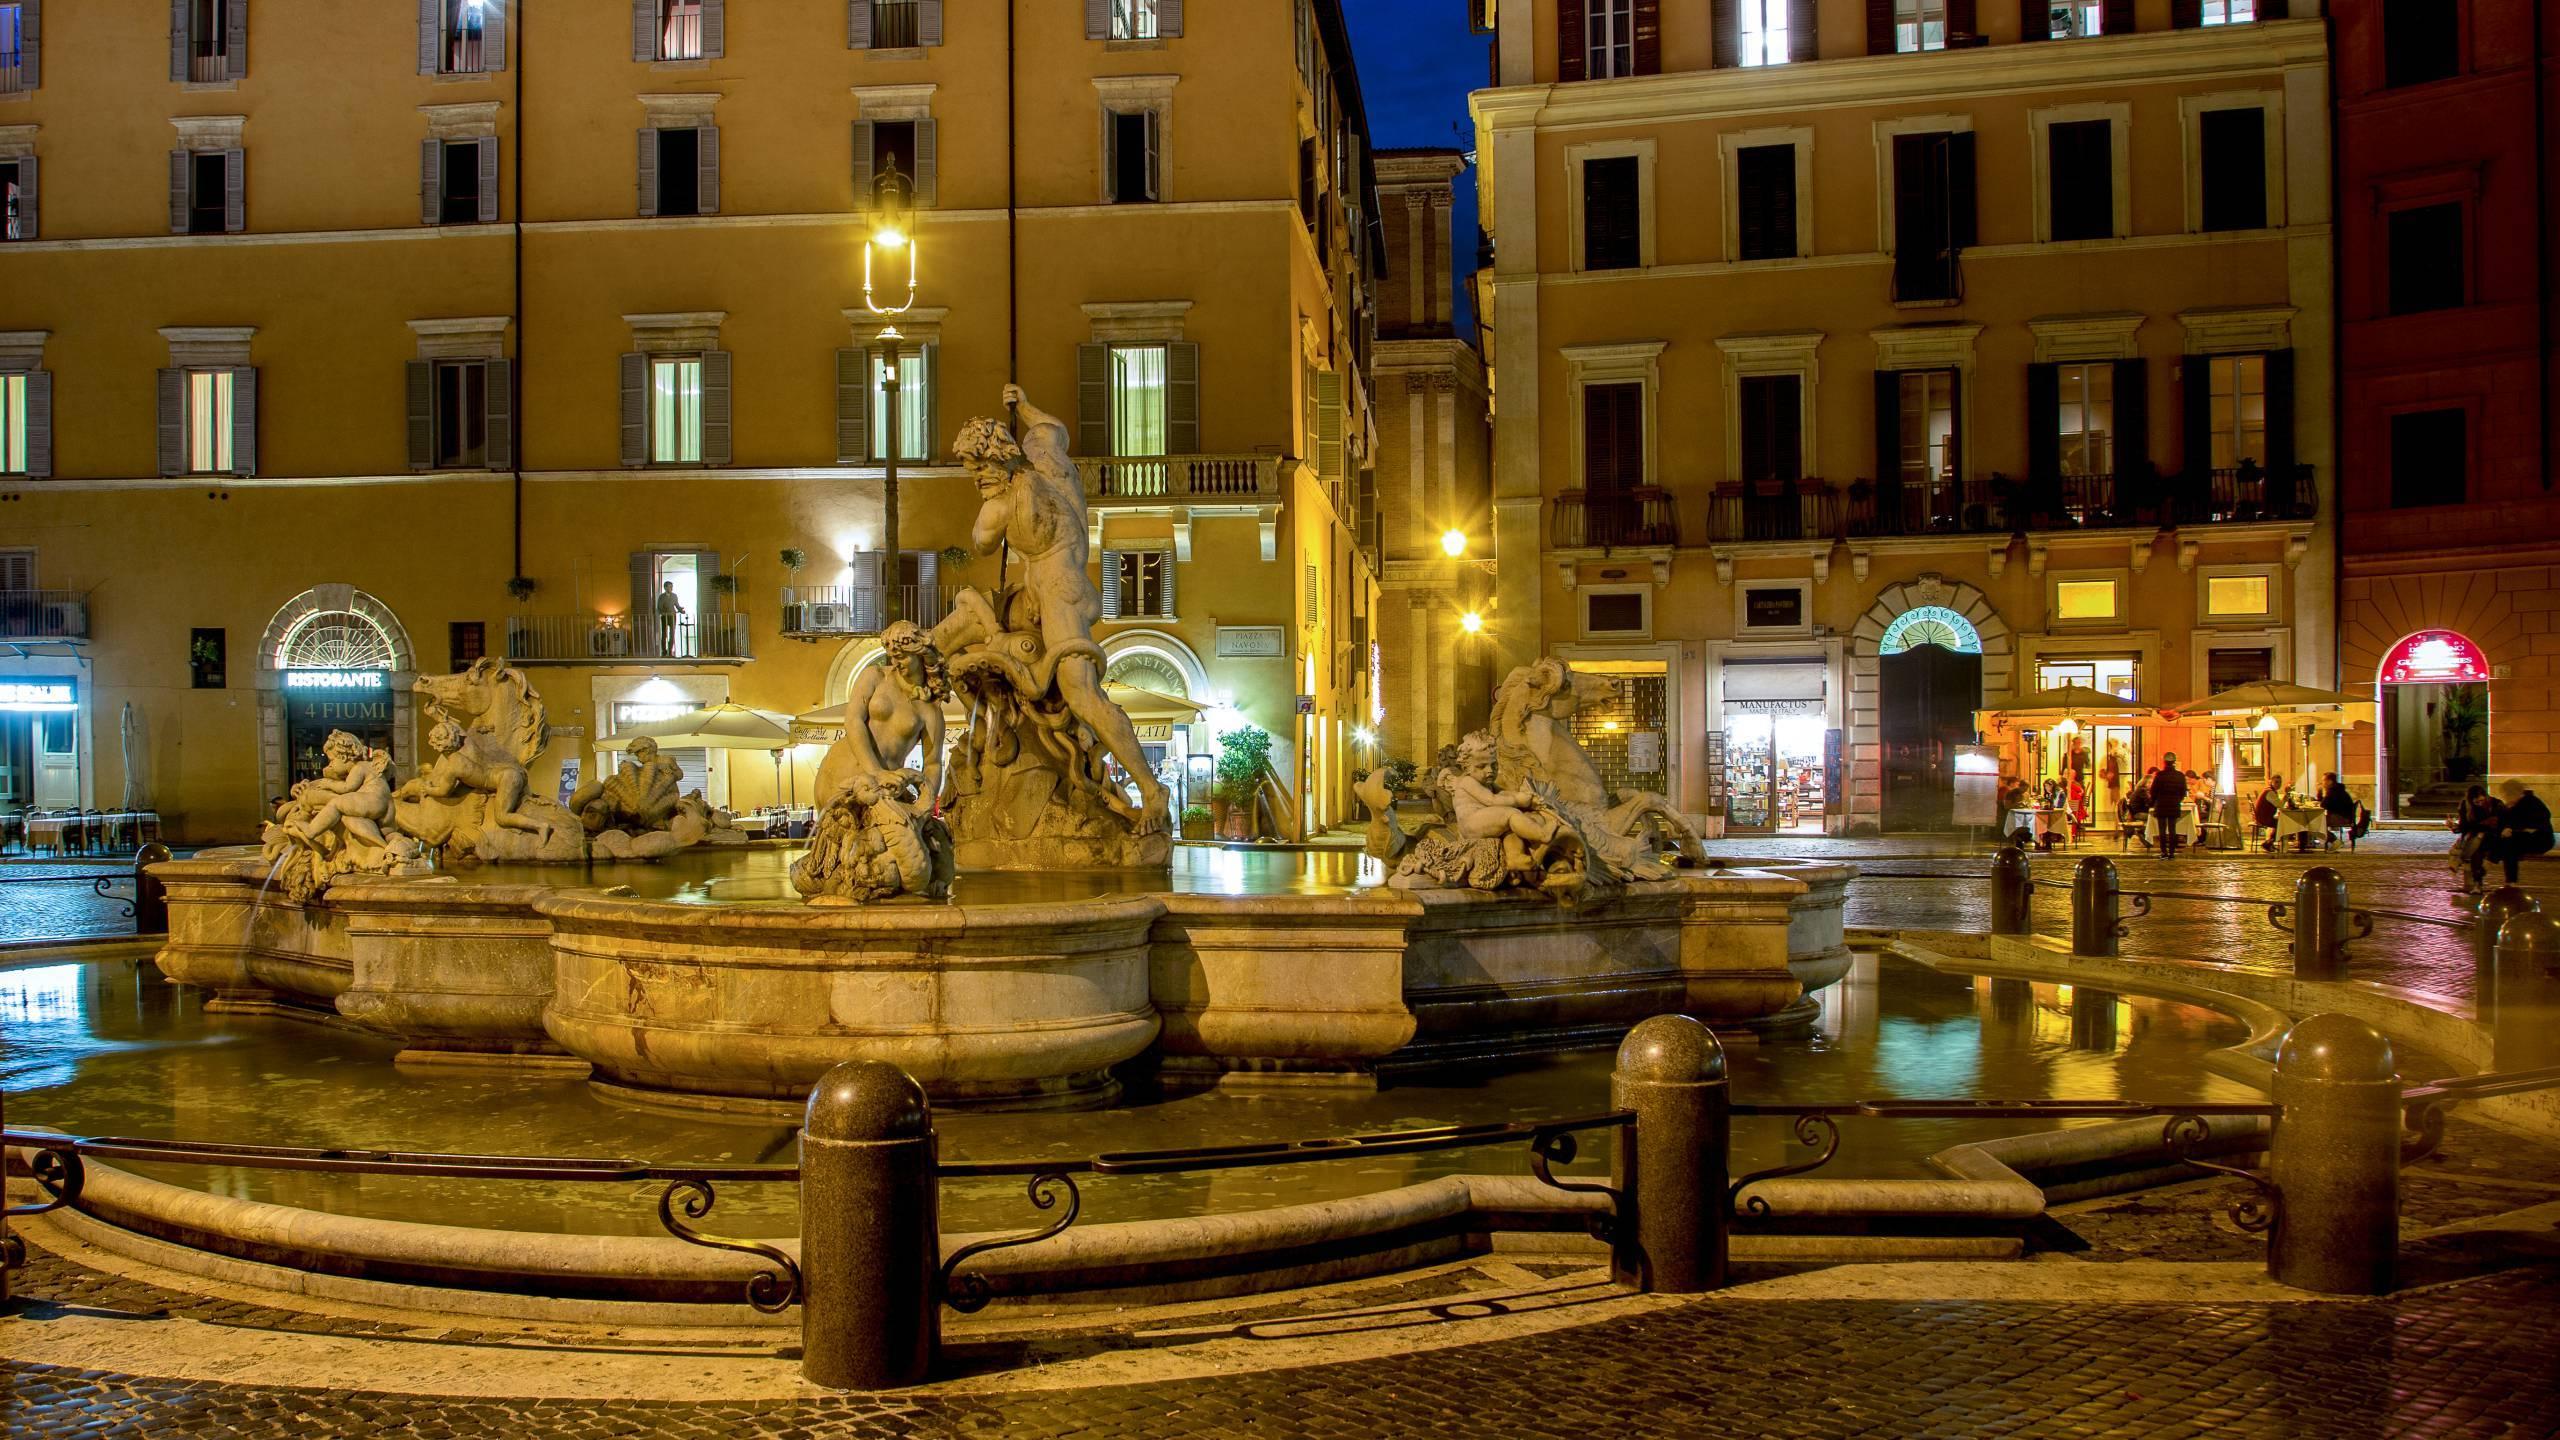 palazzo-de-cupis-roma-piazza-navona31